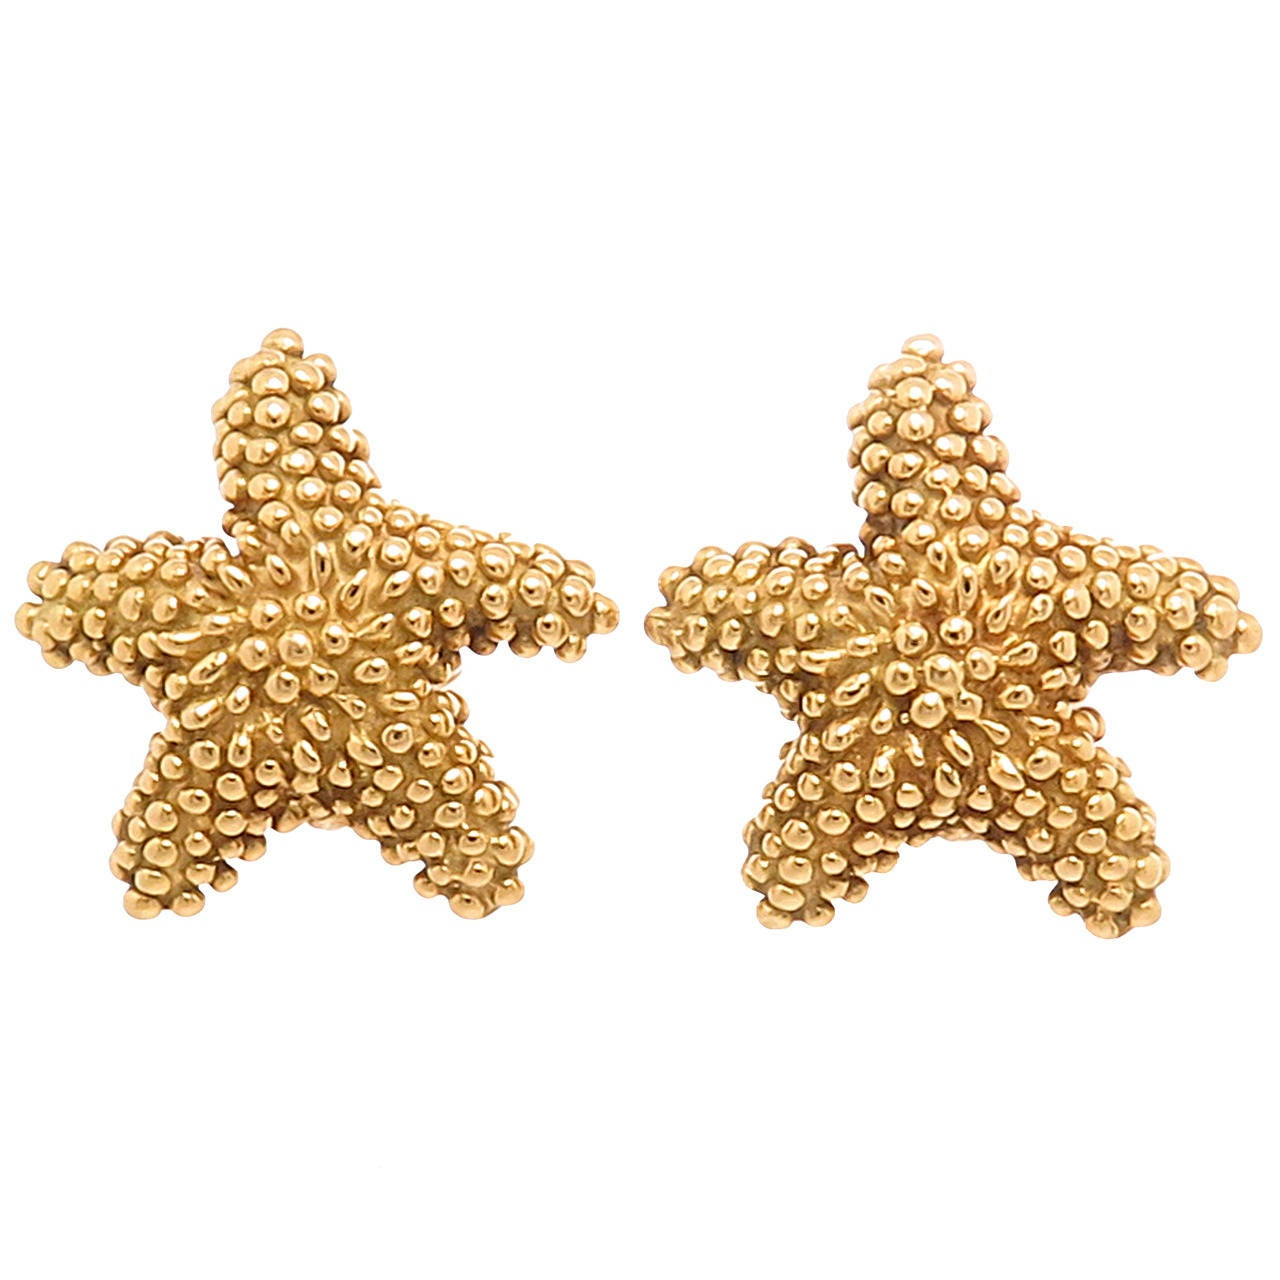 Tiffany & Co. Yellow Gold Starfish Earrings 1